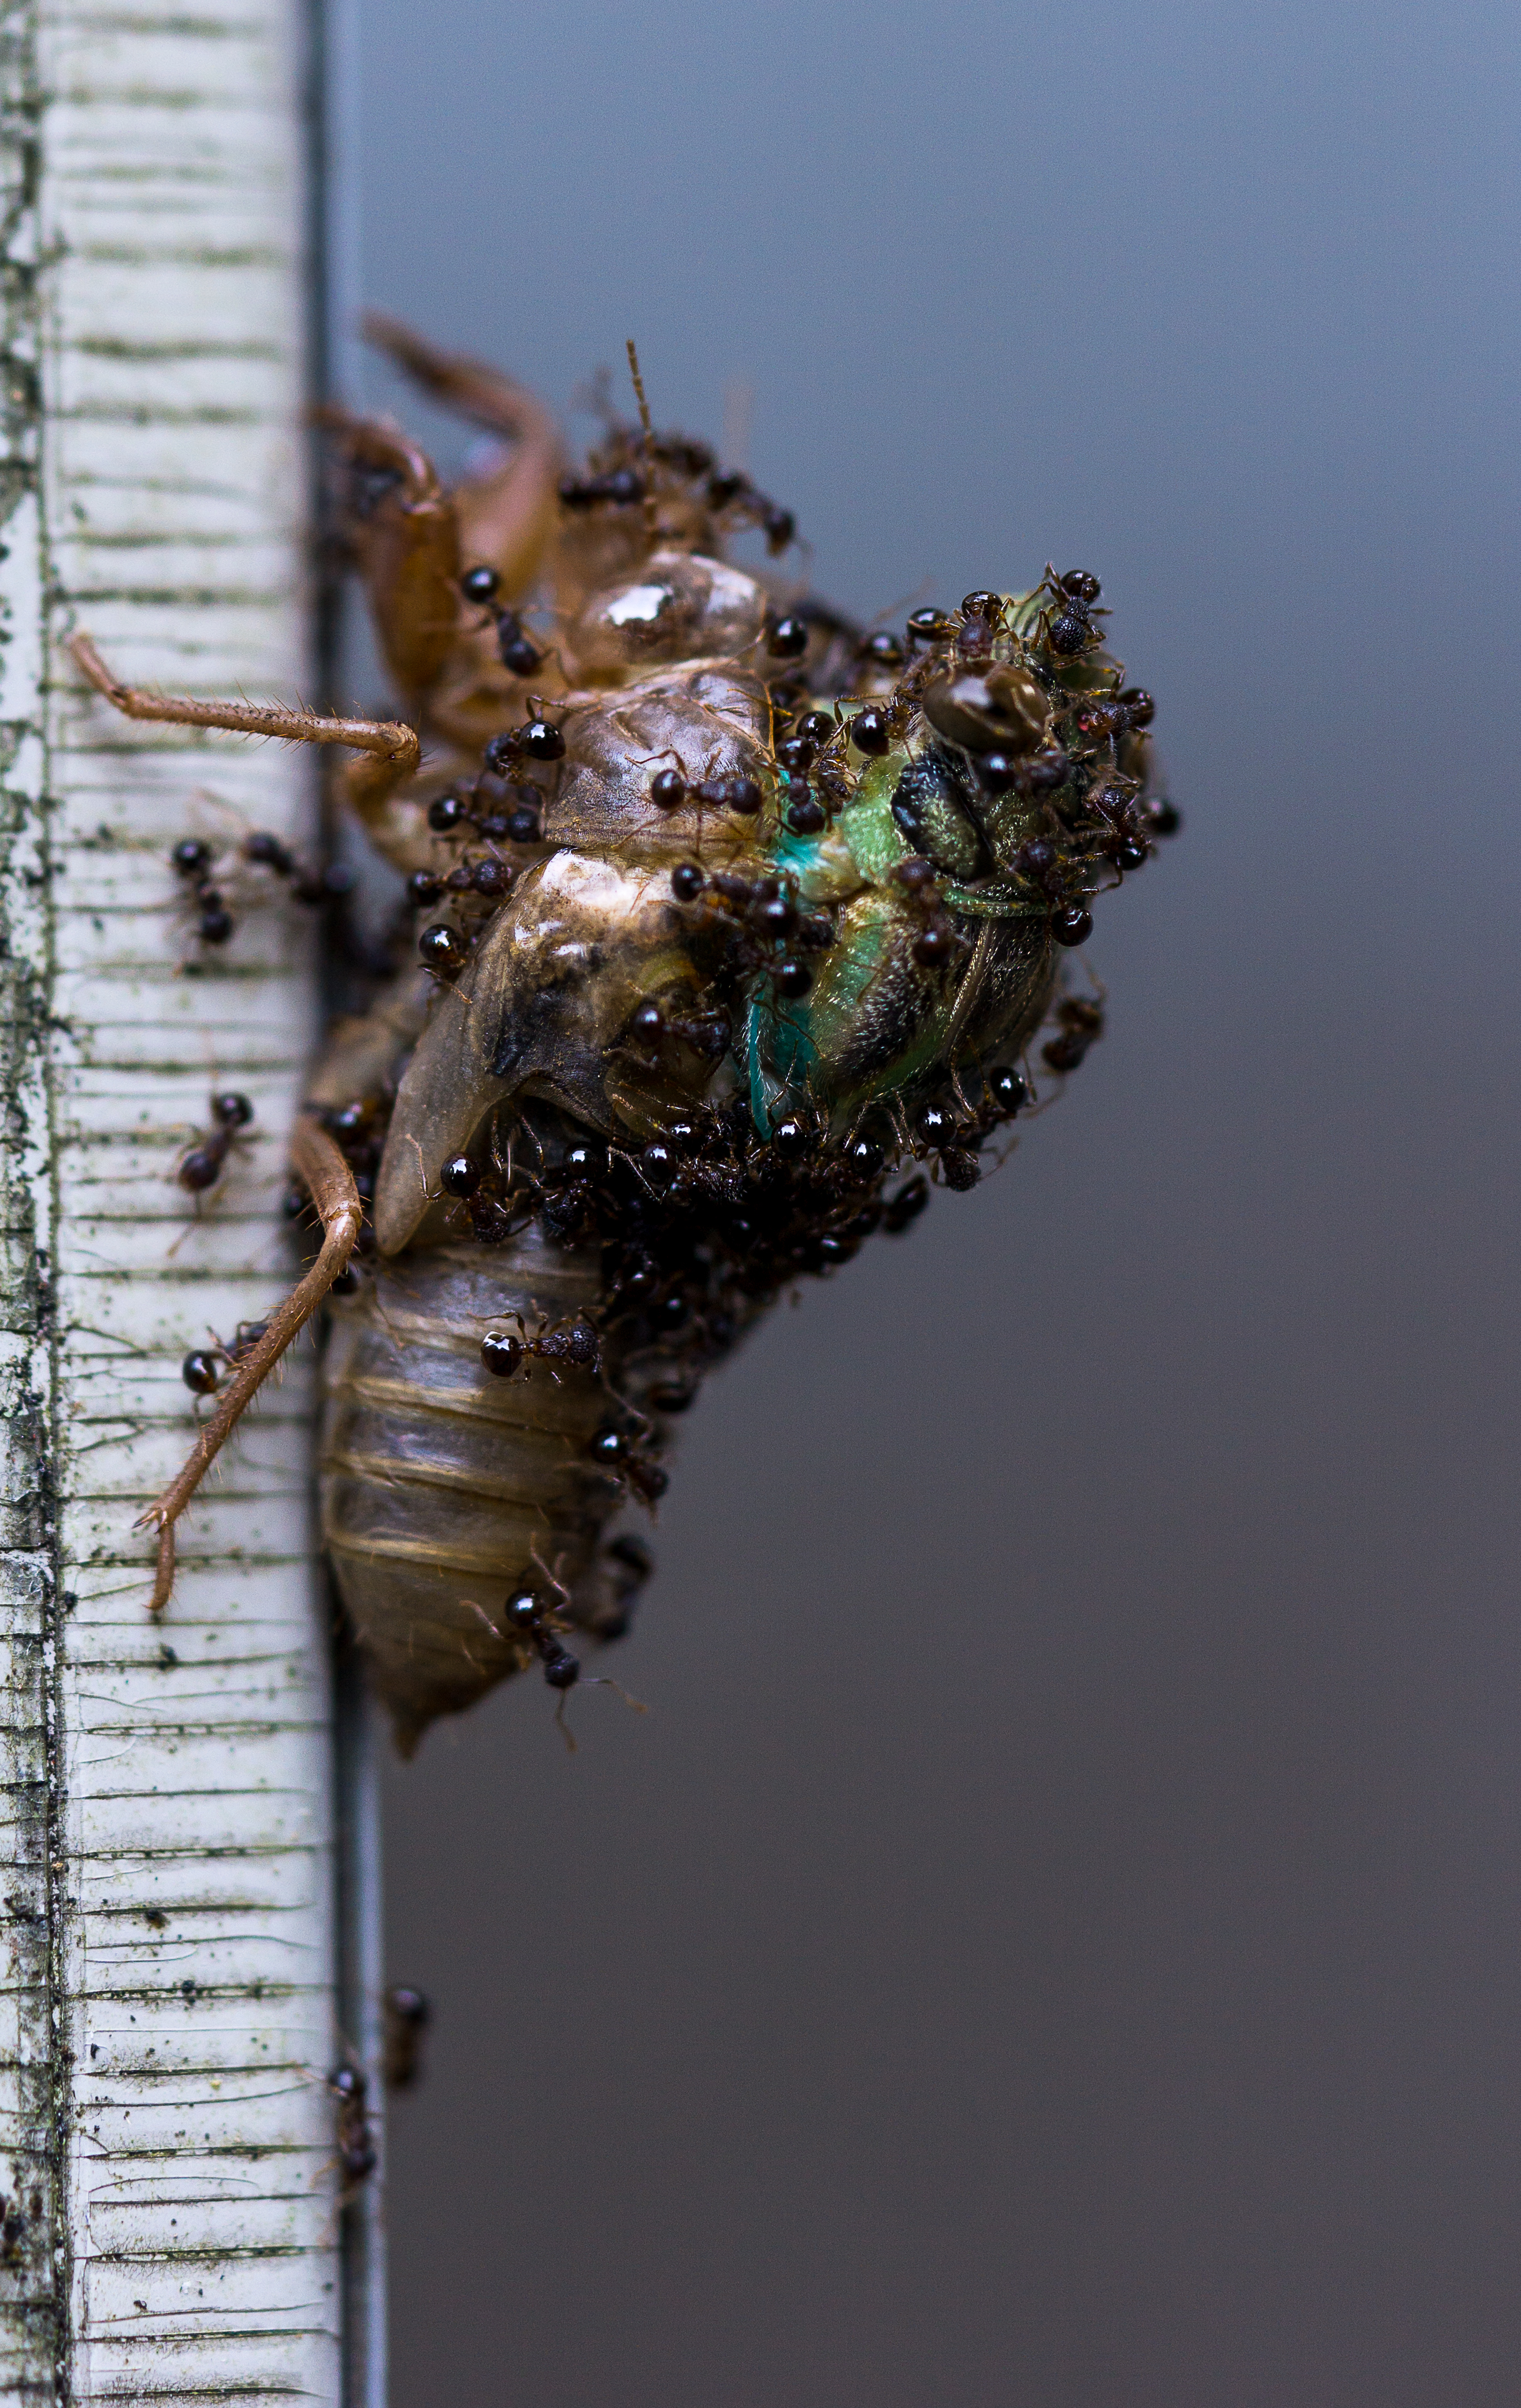 Ants attacking a Cicada [OC] [2632*4167]